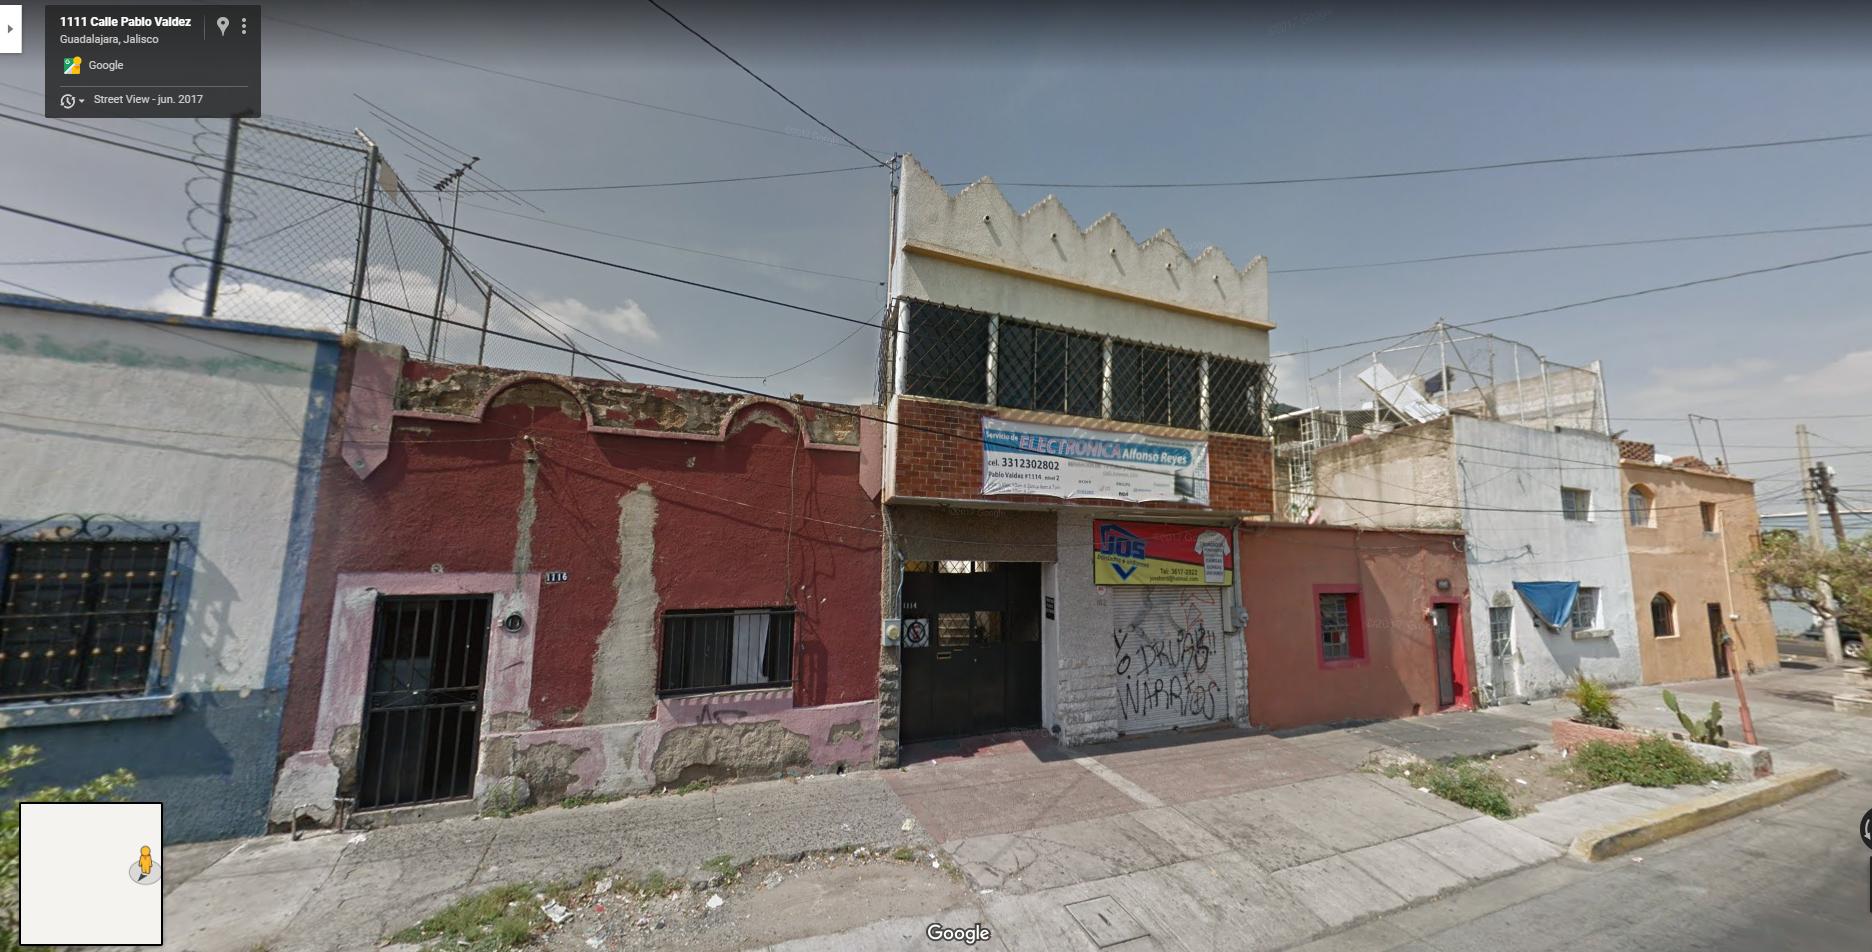 Sector Libertad, Pablo Valdez 1112 y 1114 C.P.44700